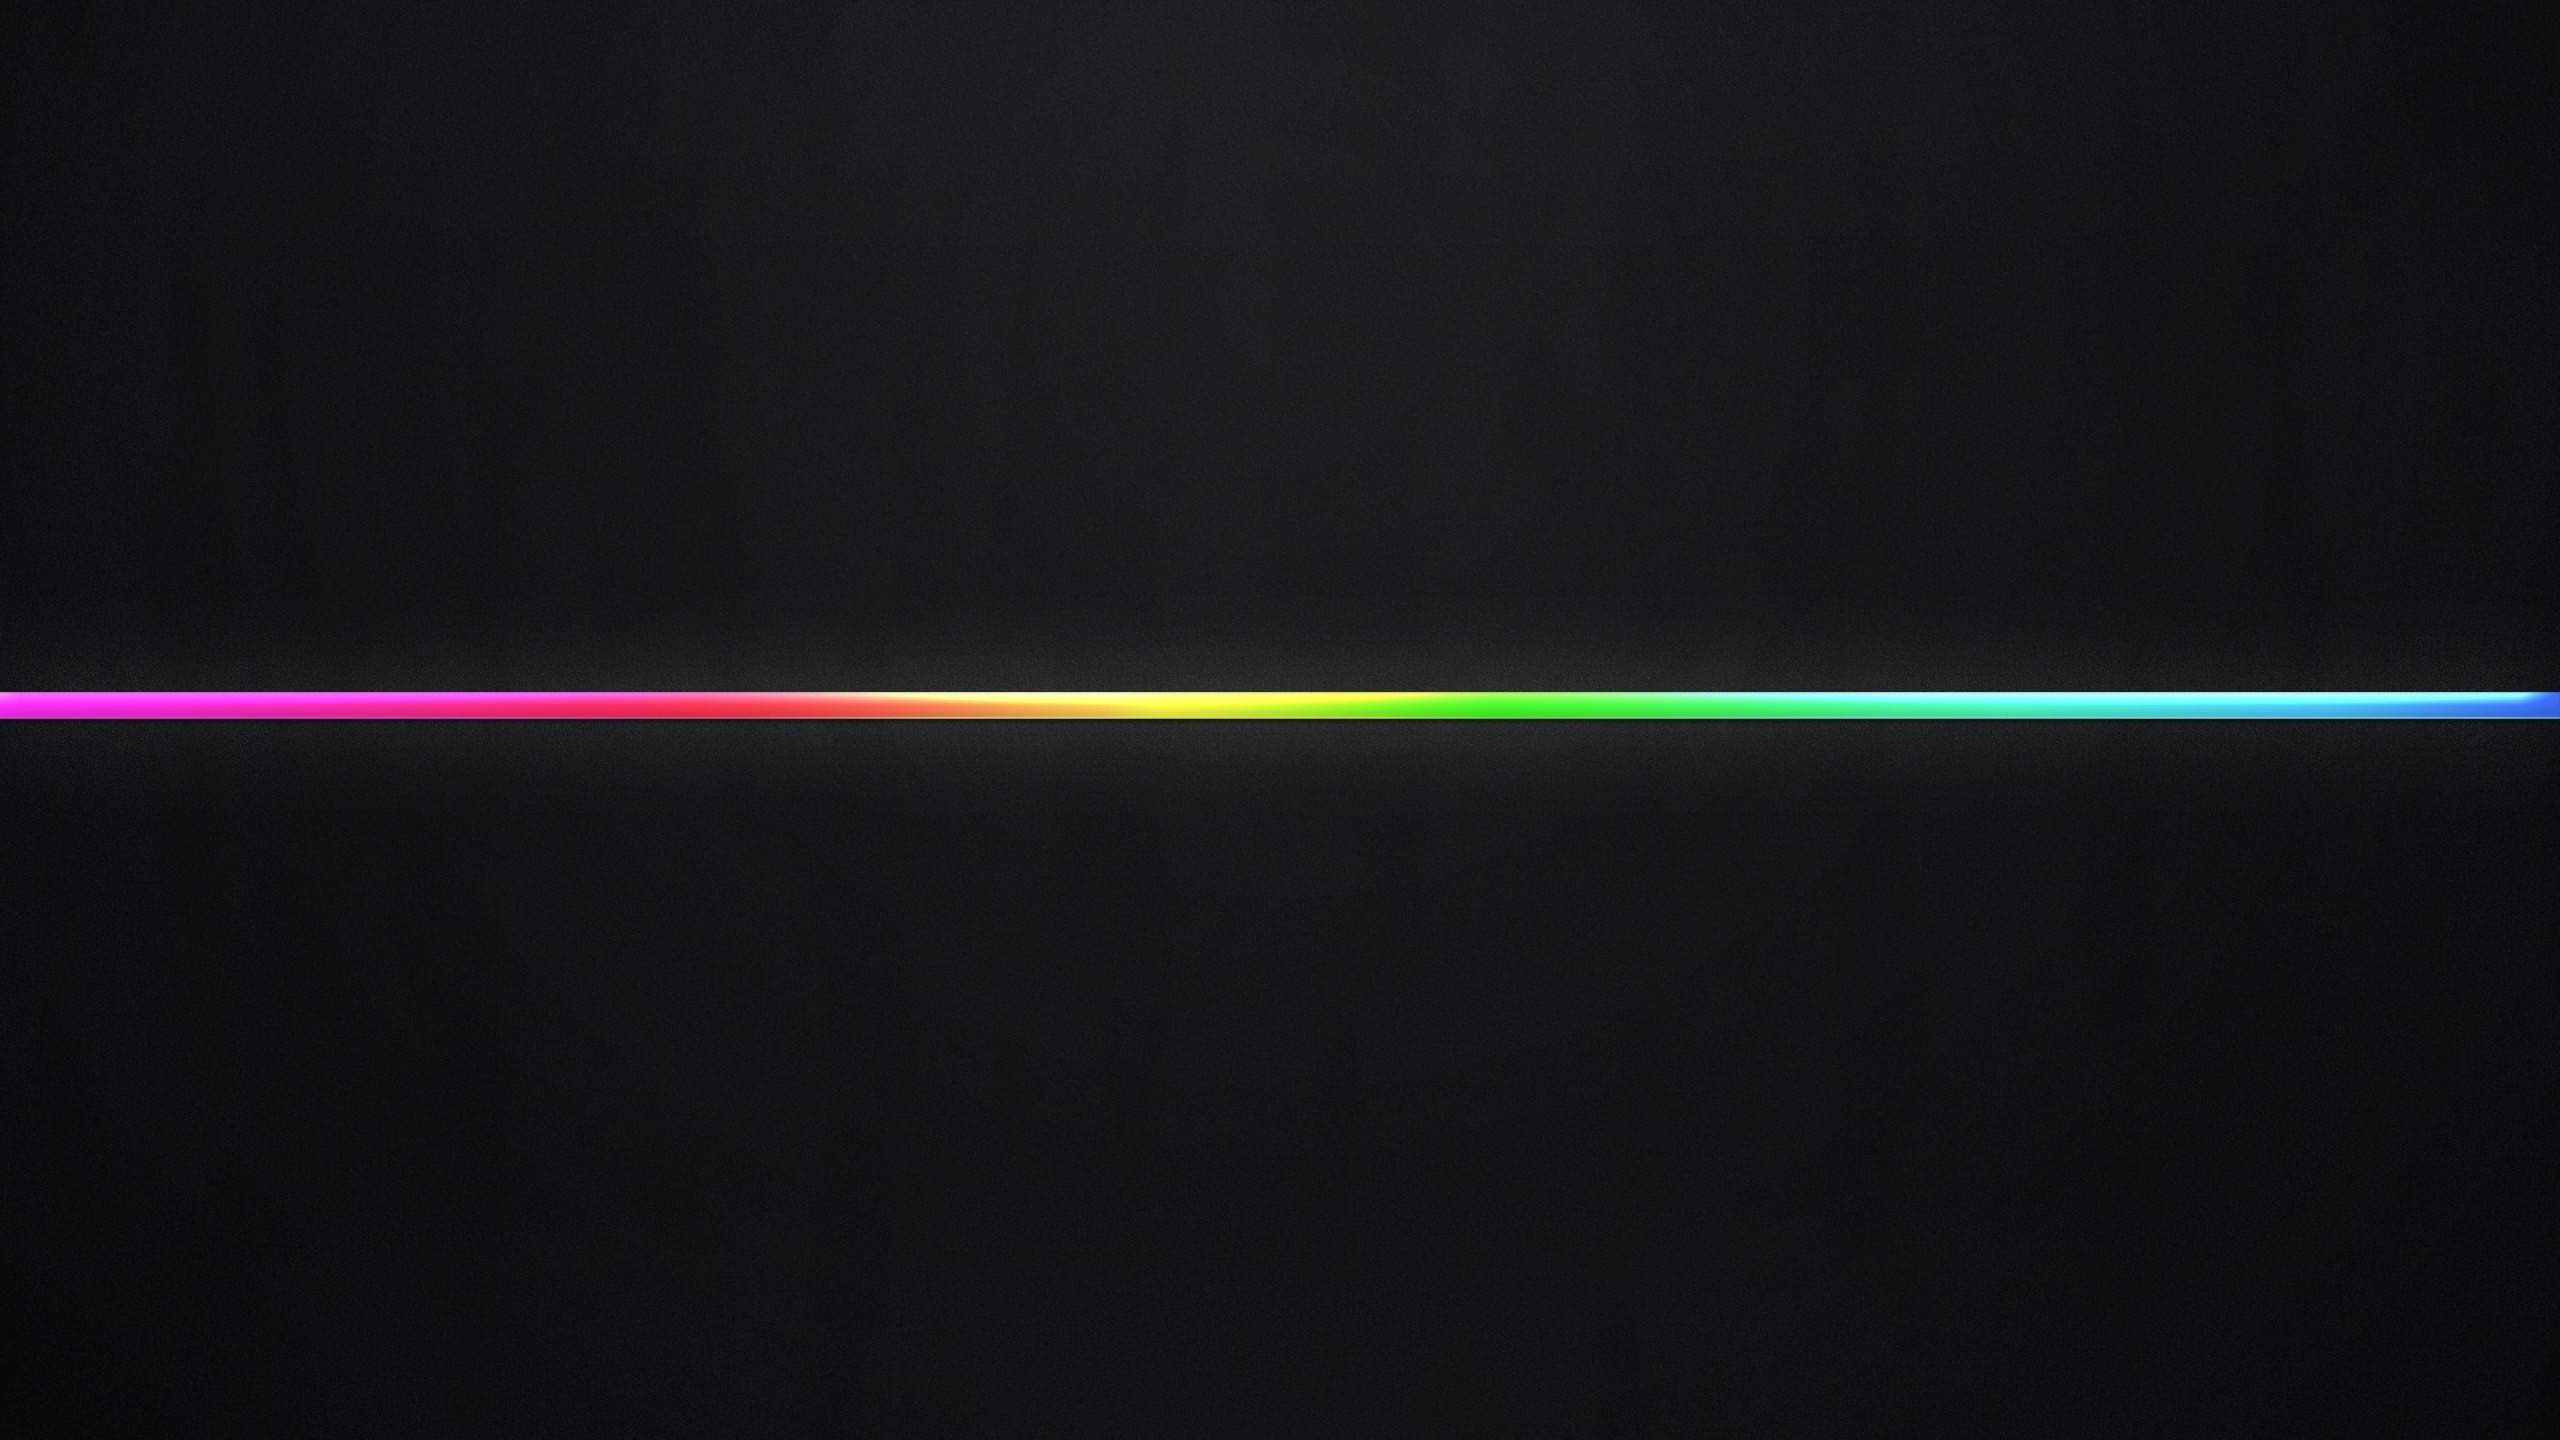 Wallpaper line, multi-colored, black background